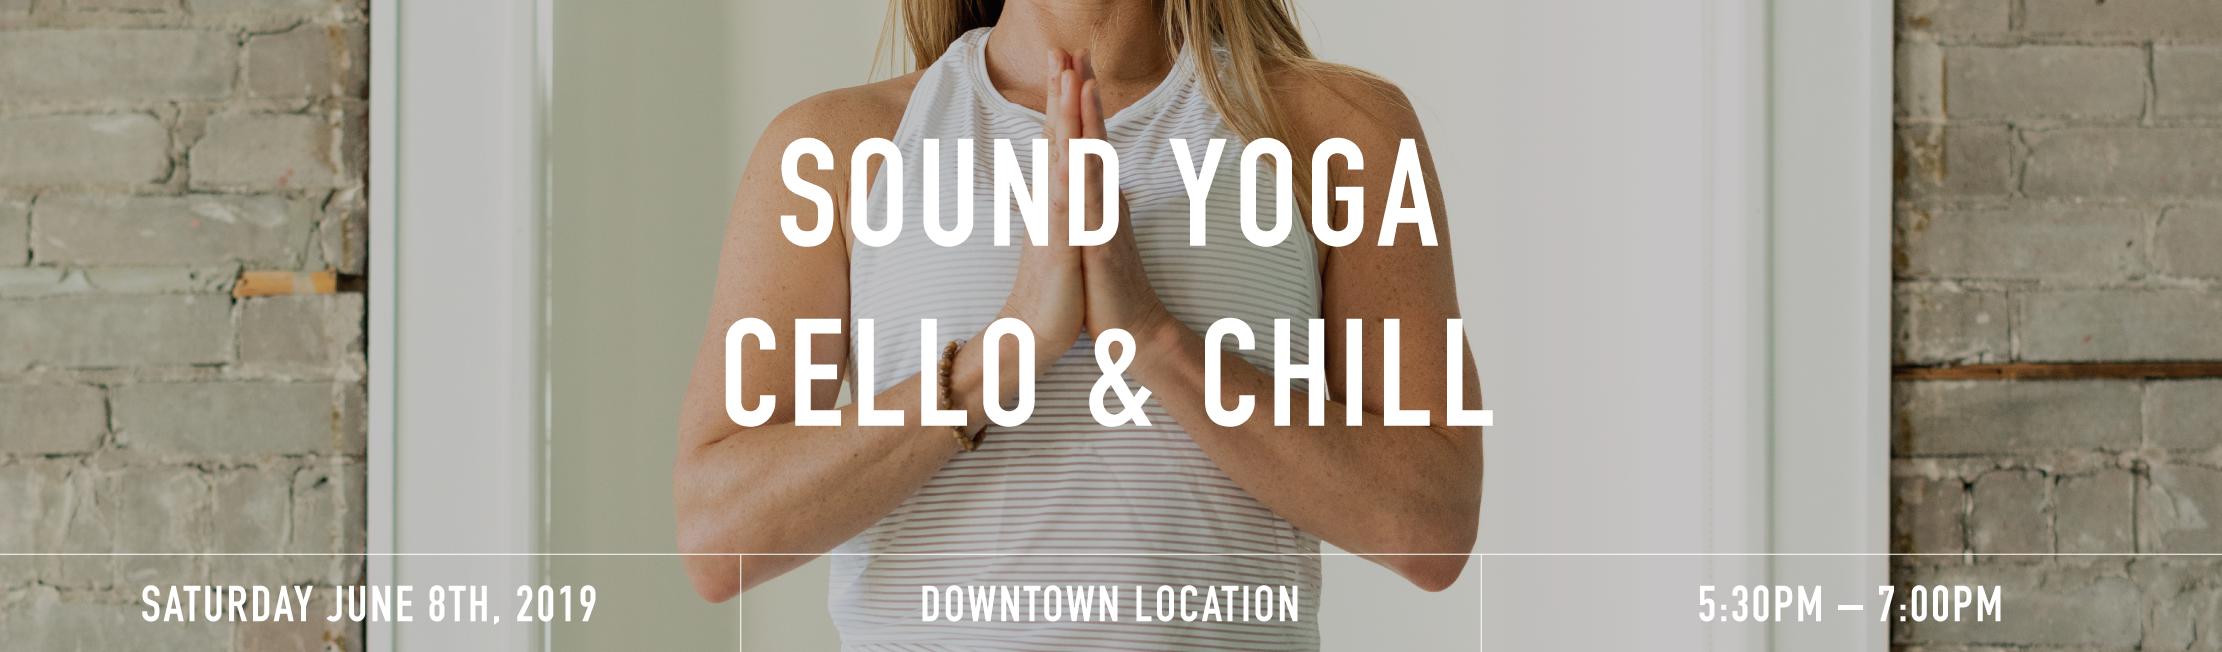 Sound yoga banner